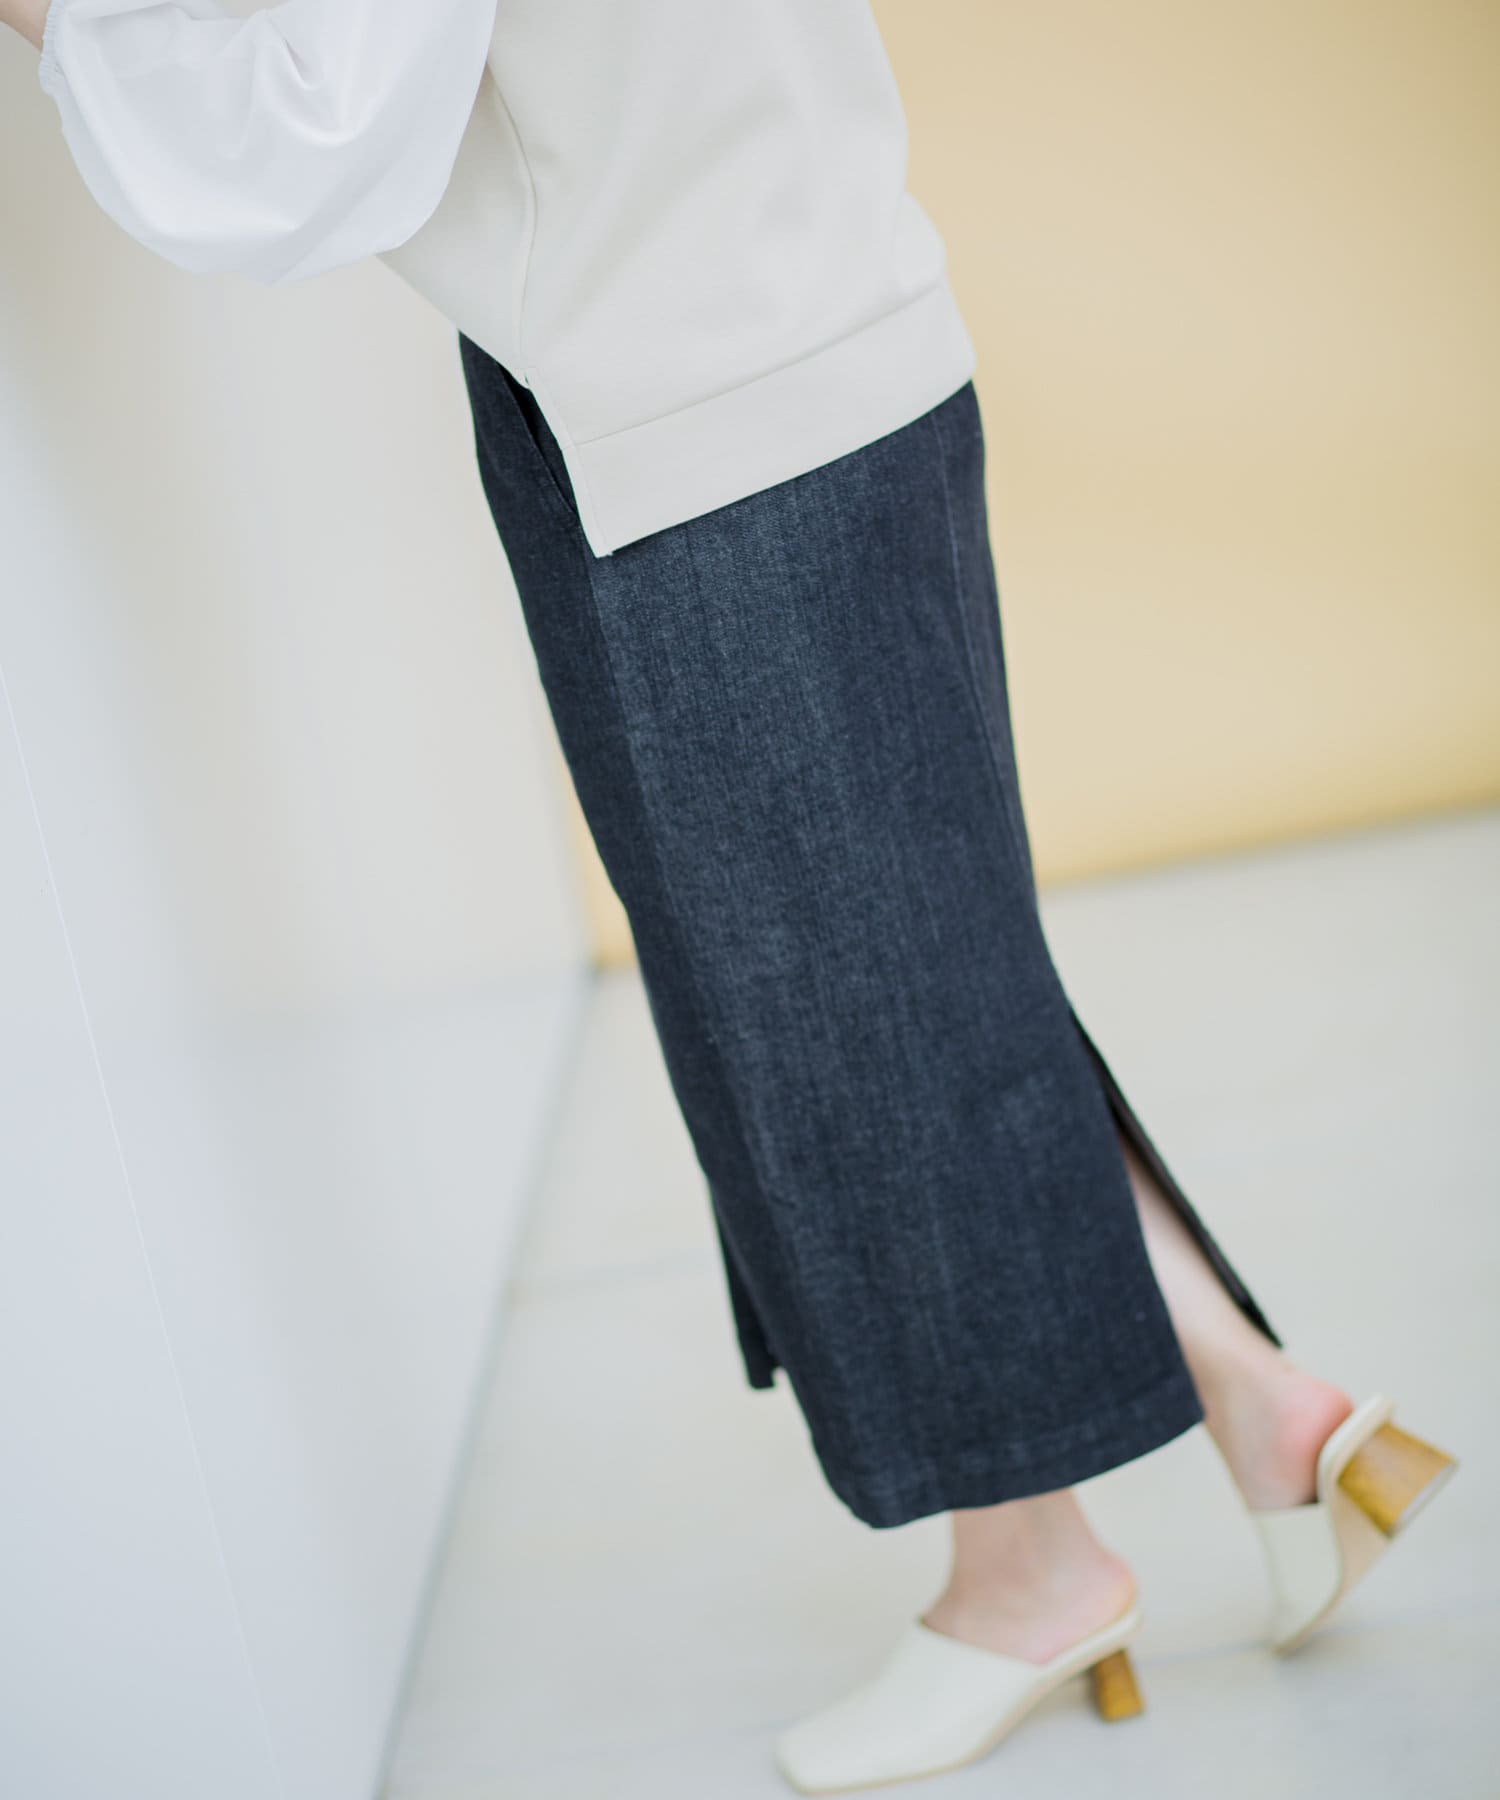 Thevon(ゼヴォン) ジップデニムタイトスカート